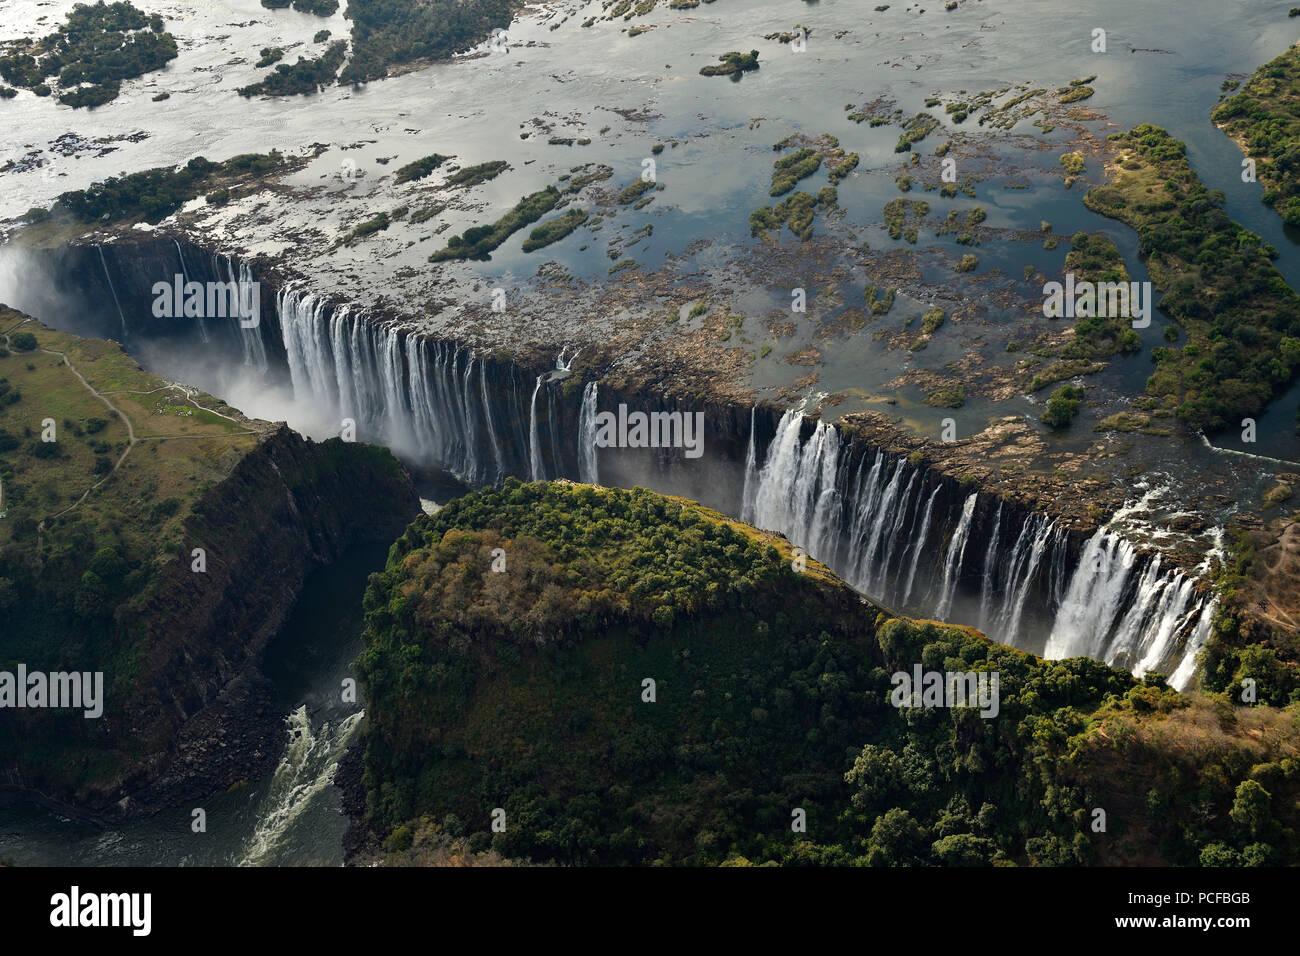 Luftaufnahme, Victoria Falls, Simbabwe, Afrika Stockfoto